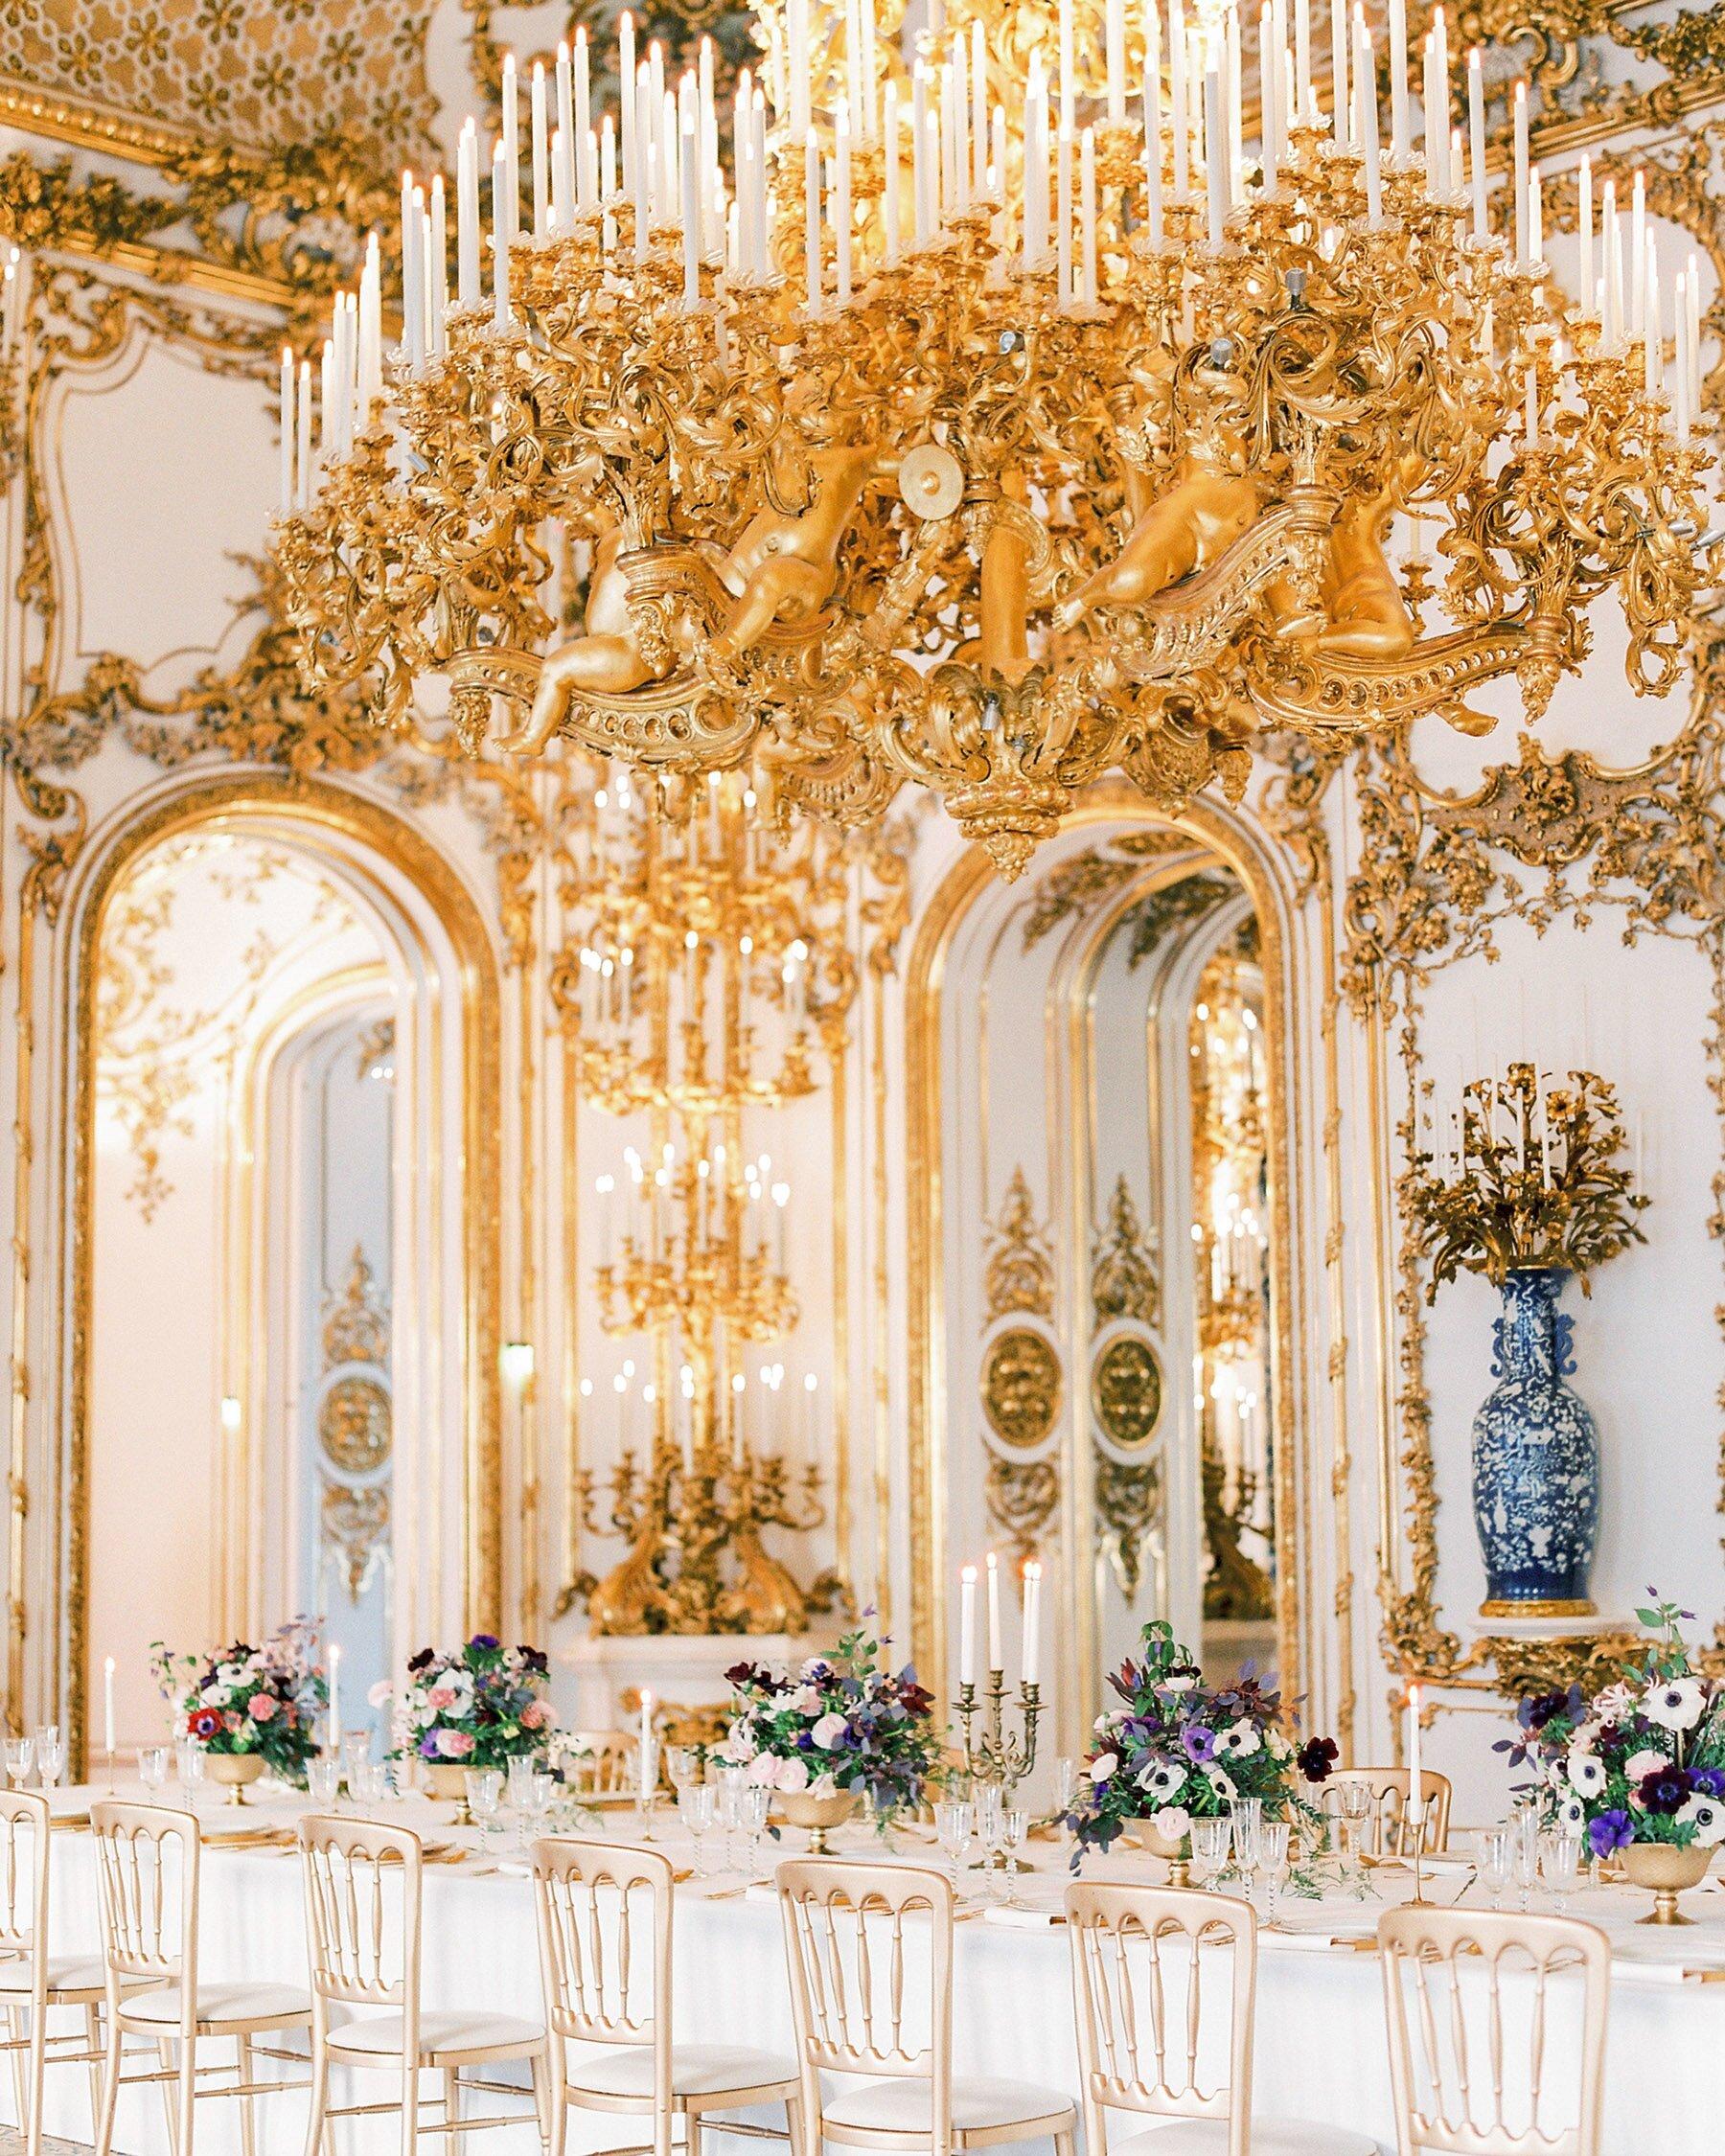 23 Glamorous Wedding Ideas For Your Luxurious Big Day